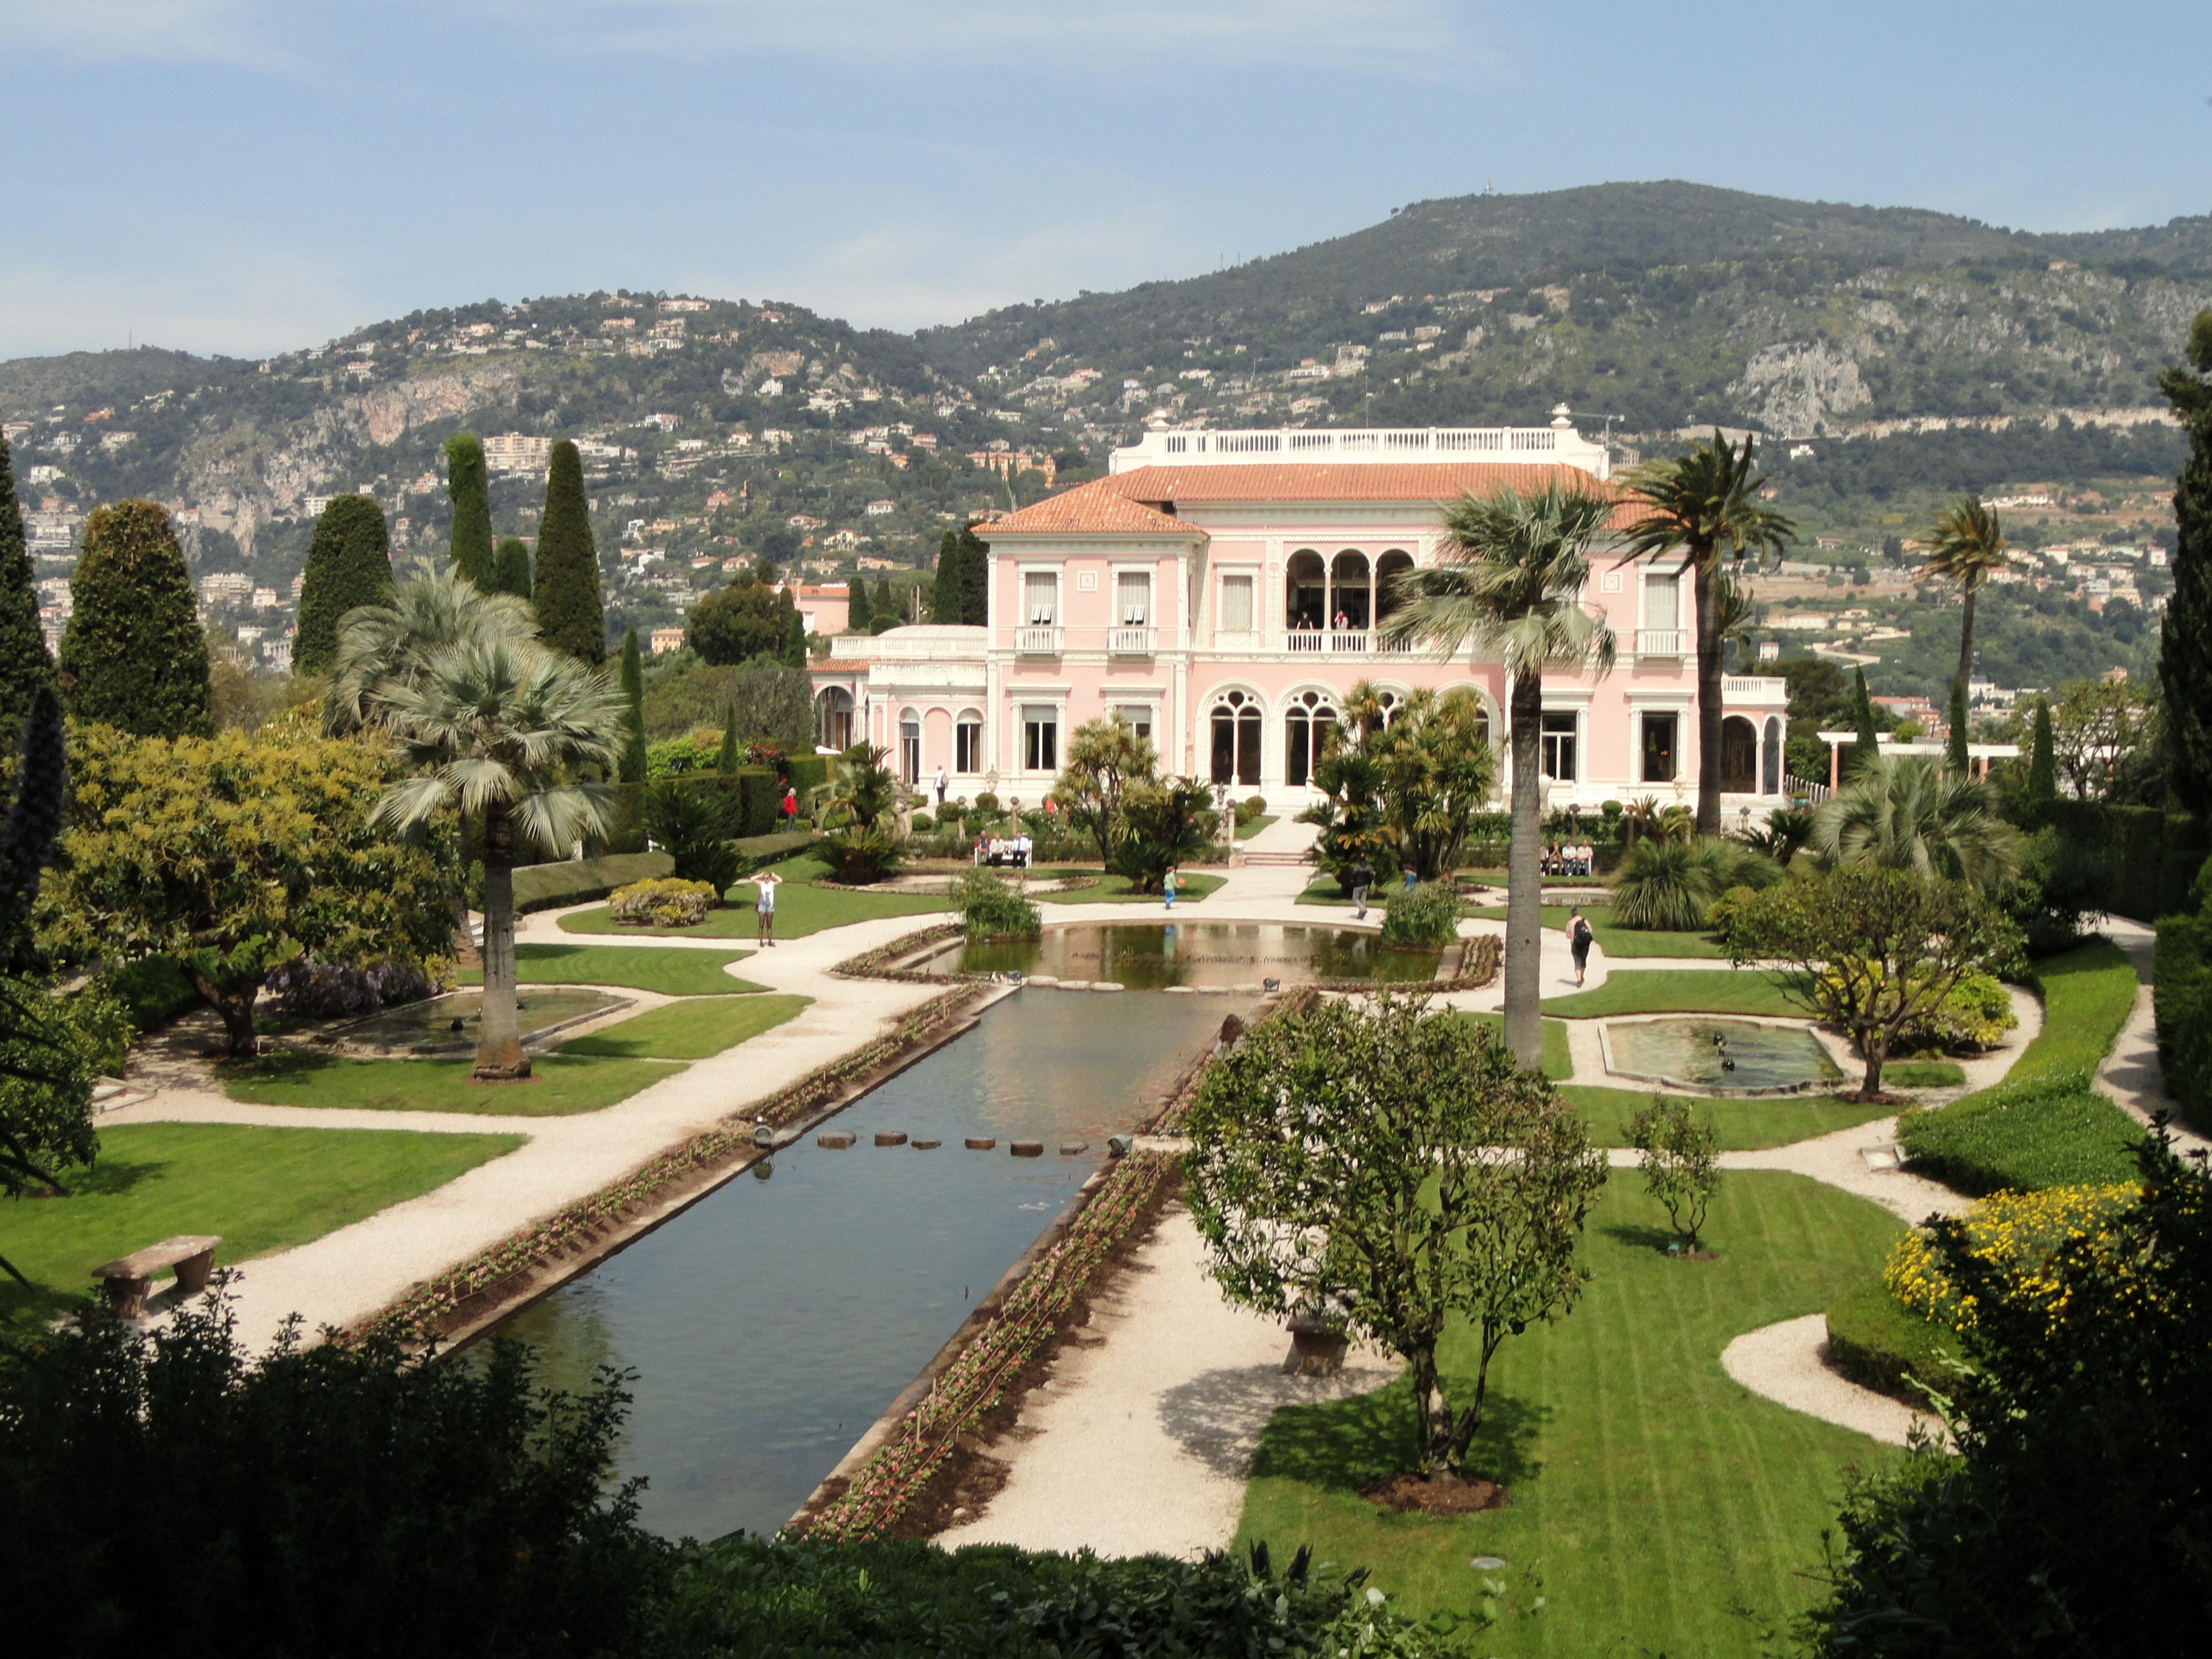 Villa Di Saint Clousd Parco Di Montrea